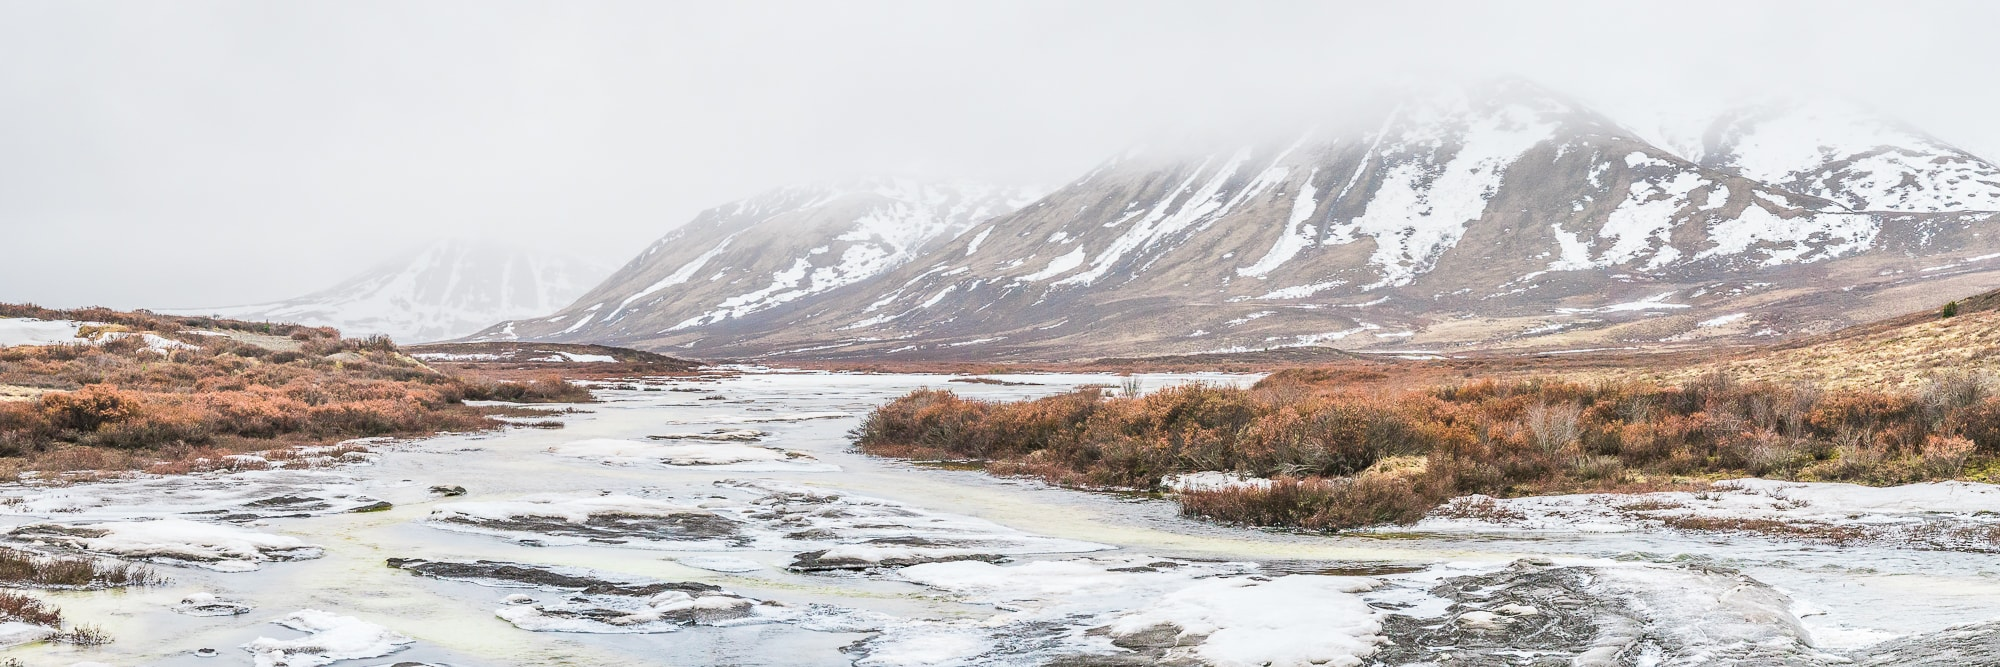 Dempster Highway Yukon Trips